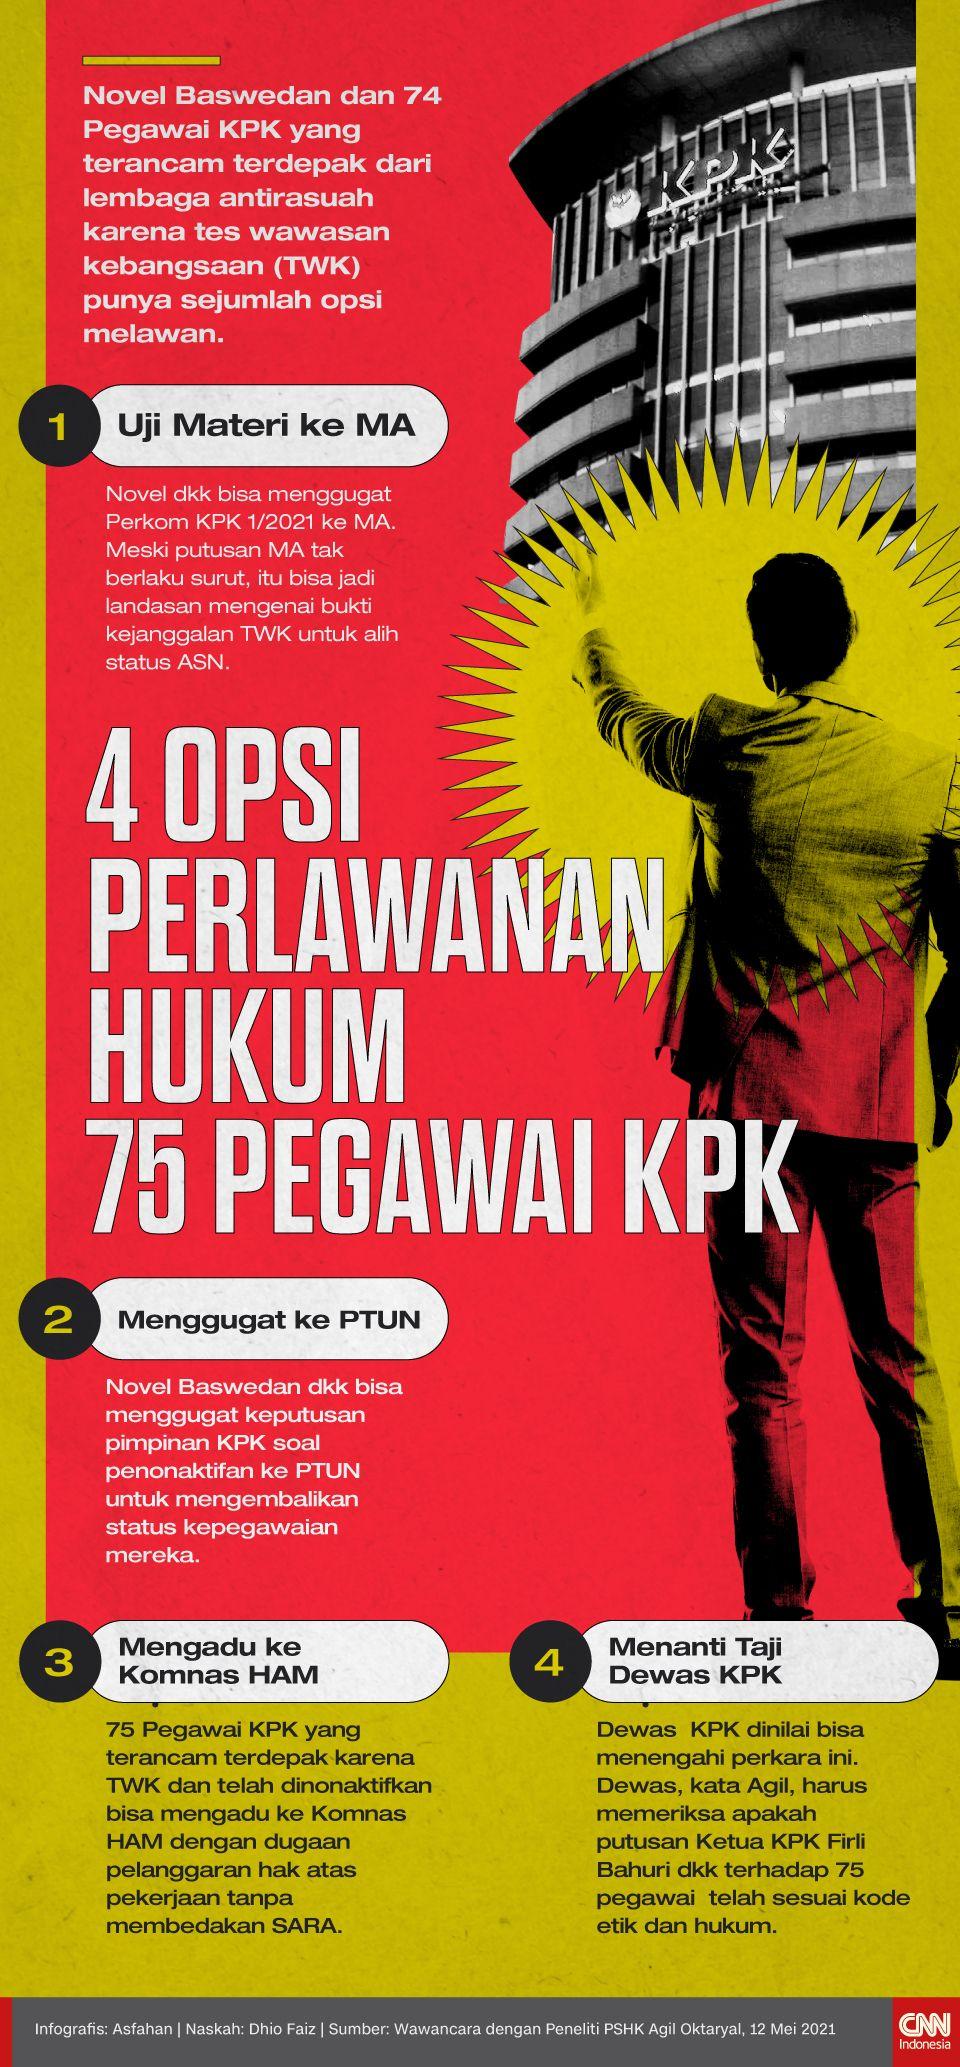 Infografis 4 Opsi Perlawanan Hukum 75 Pegawai KPK